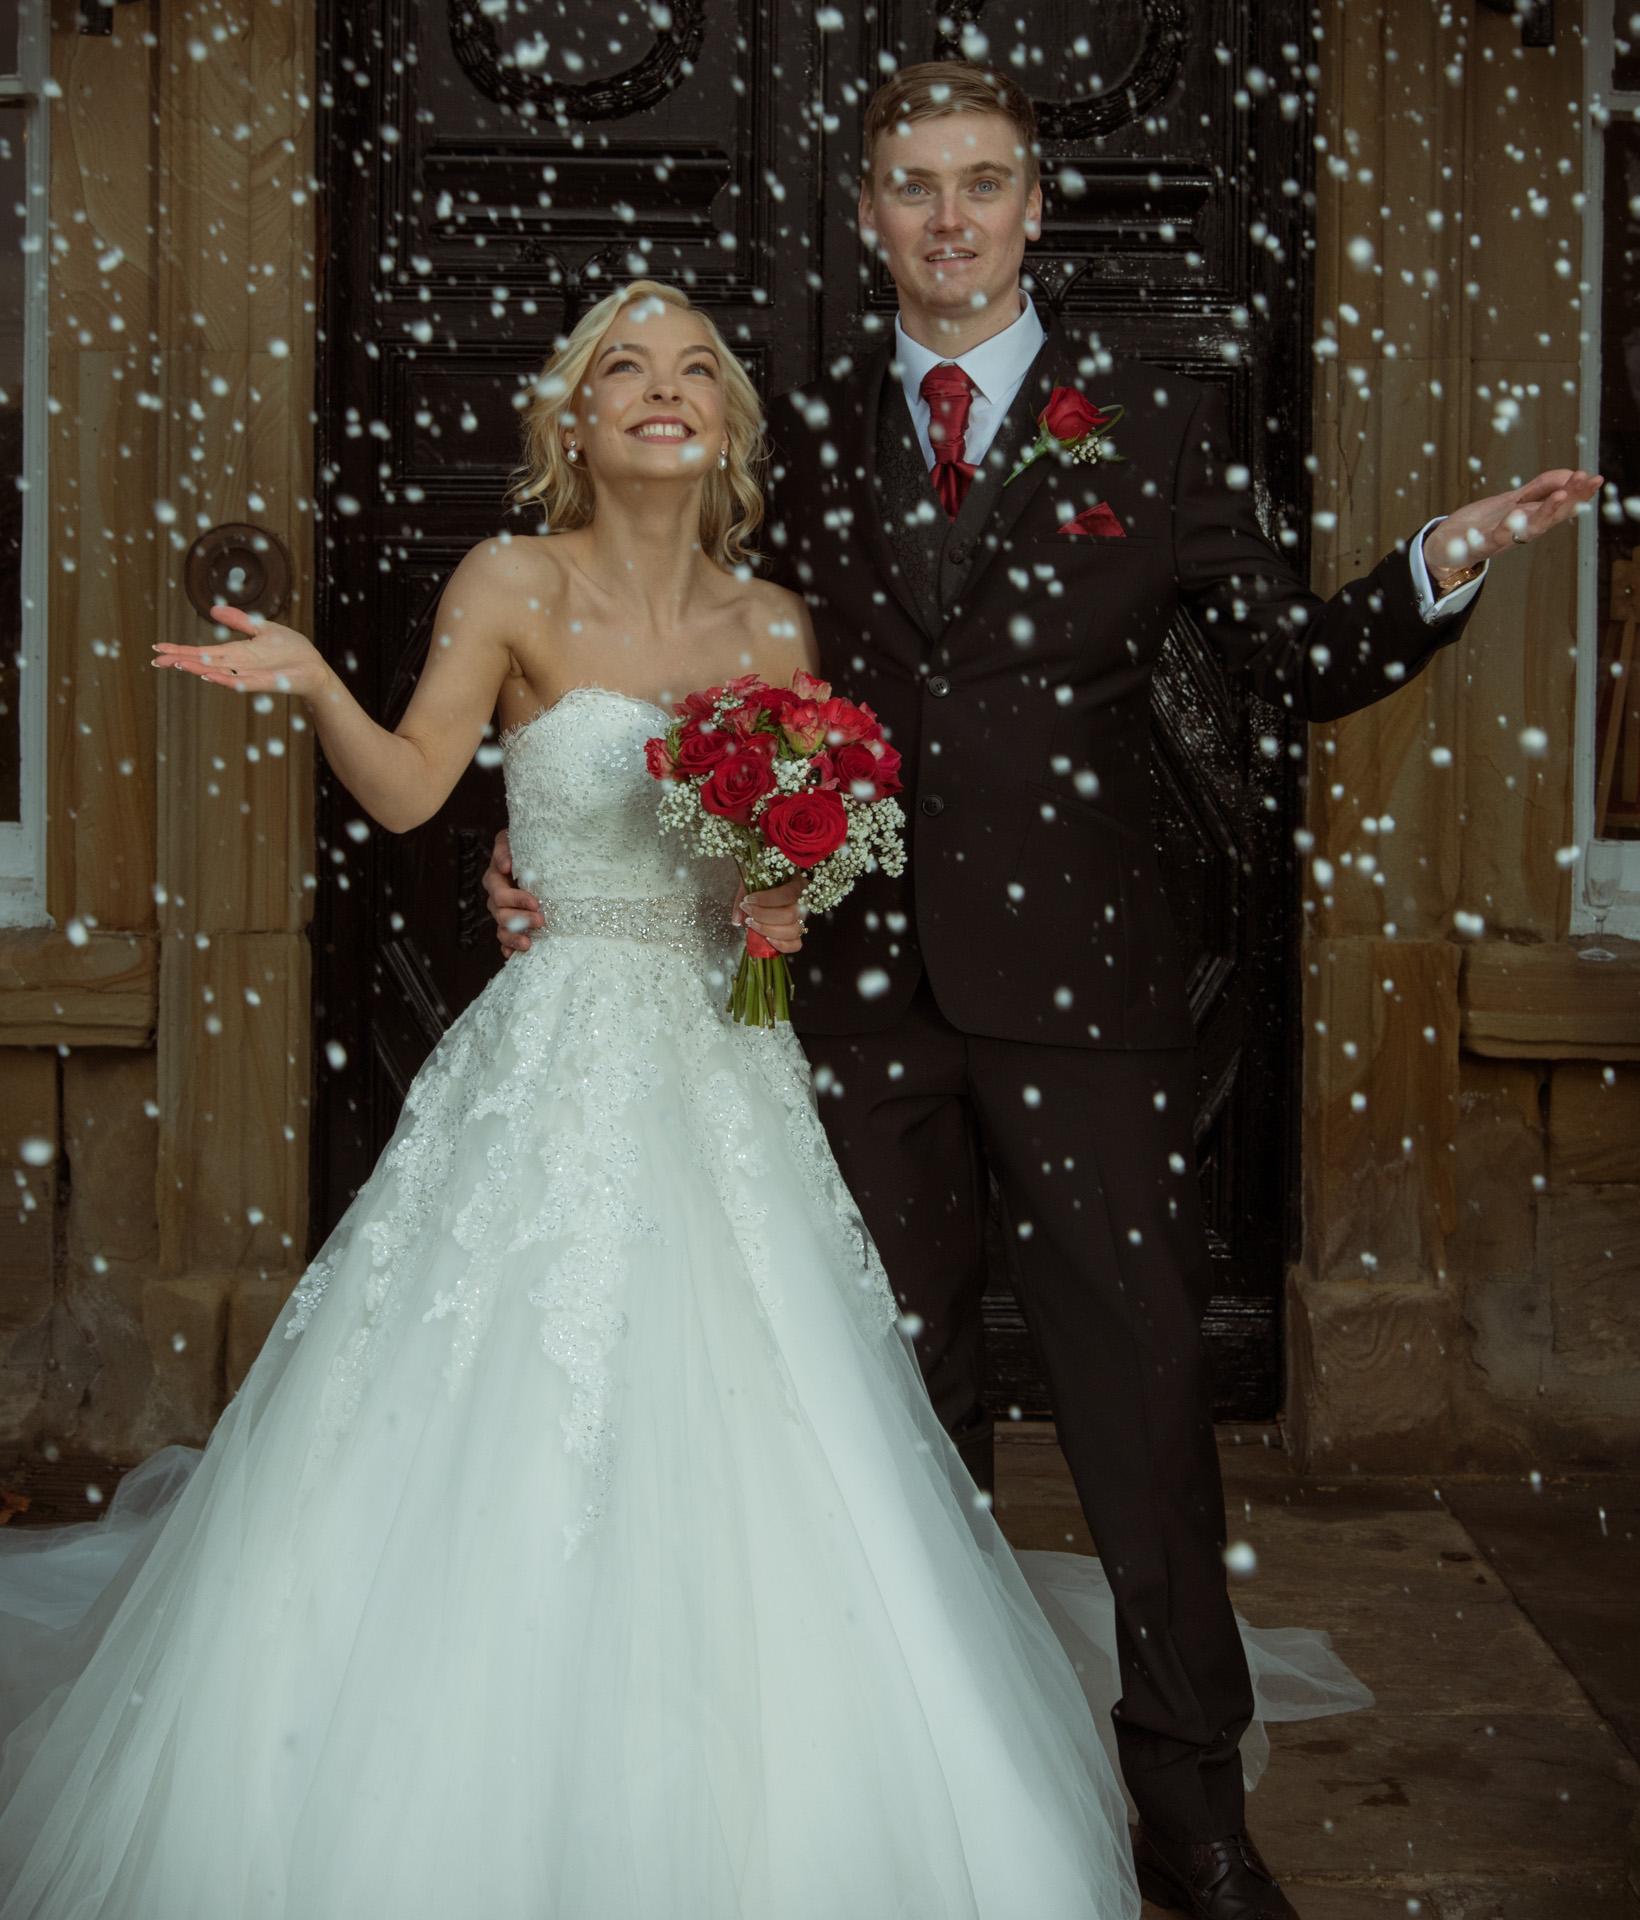 Dean& Jemma at Walton Hall, Waterton Park Hotel 1